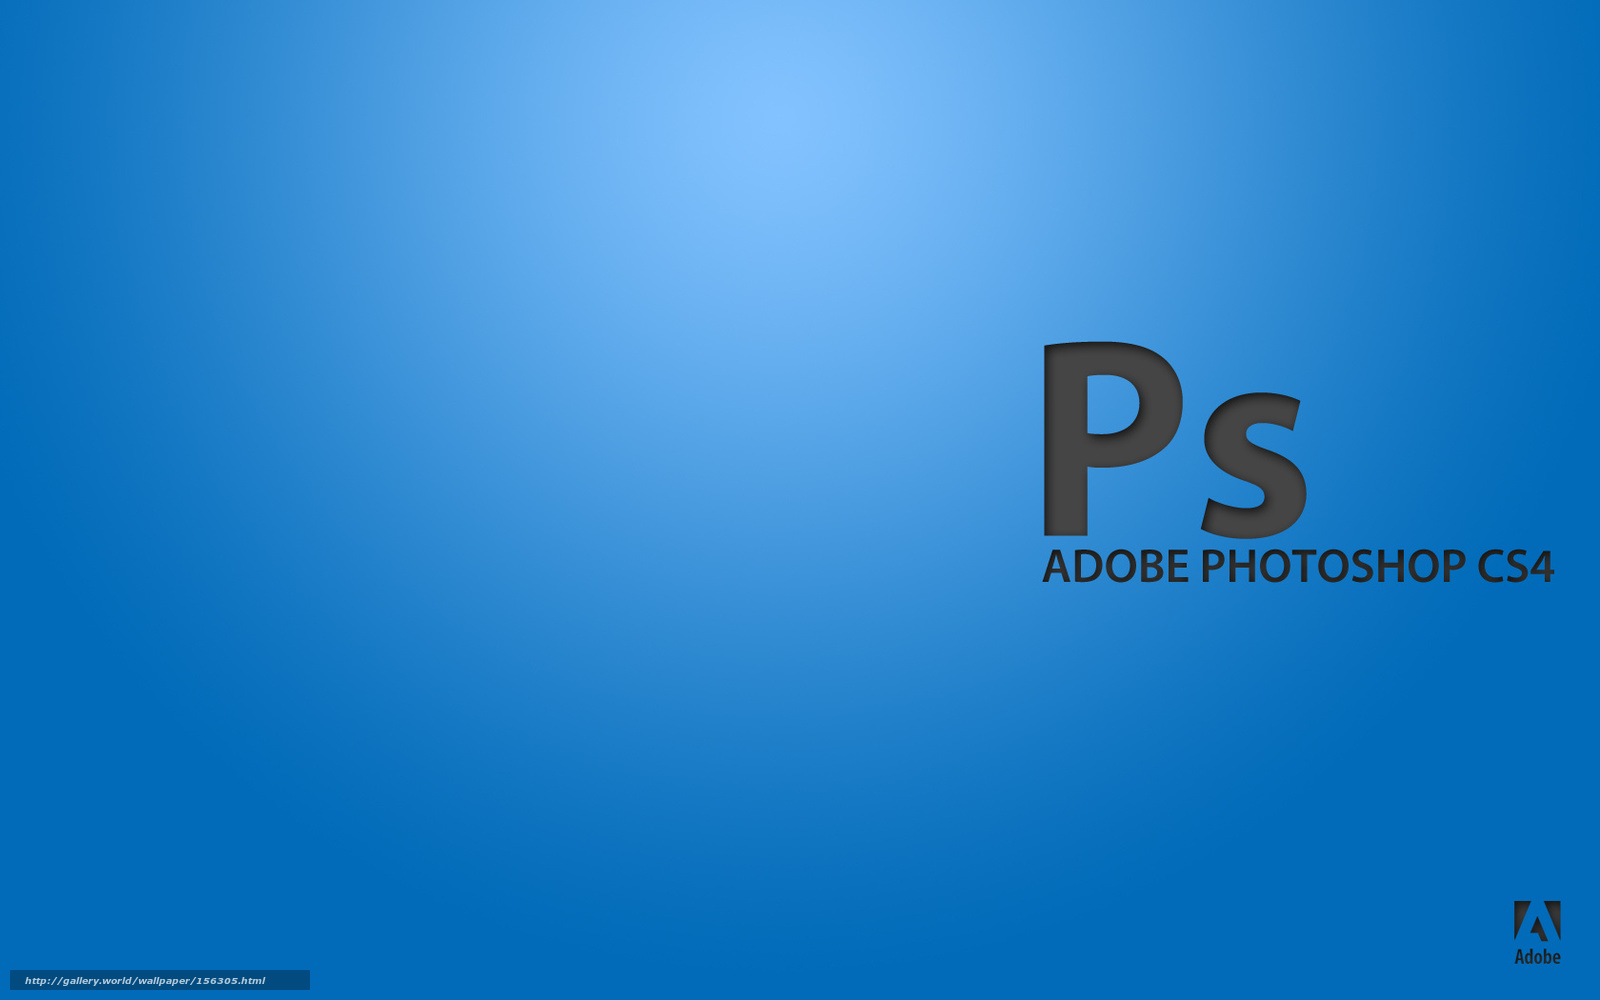 scaricare gli sfondi adobe, blu, Photoshop, programma Sfondi